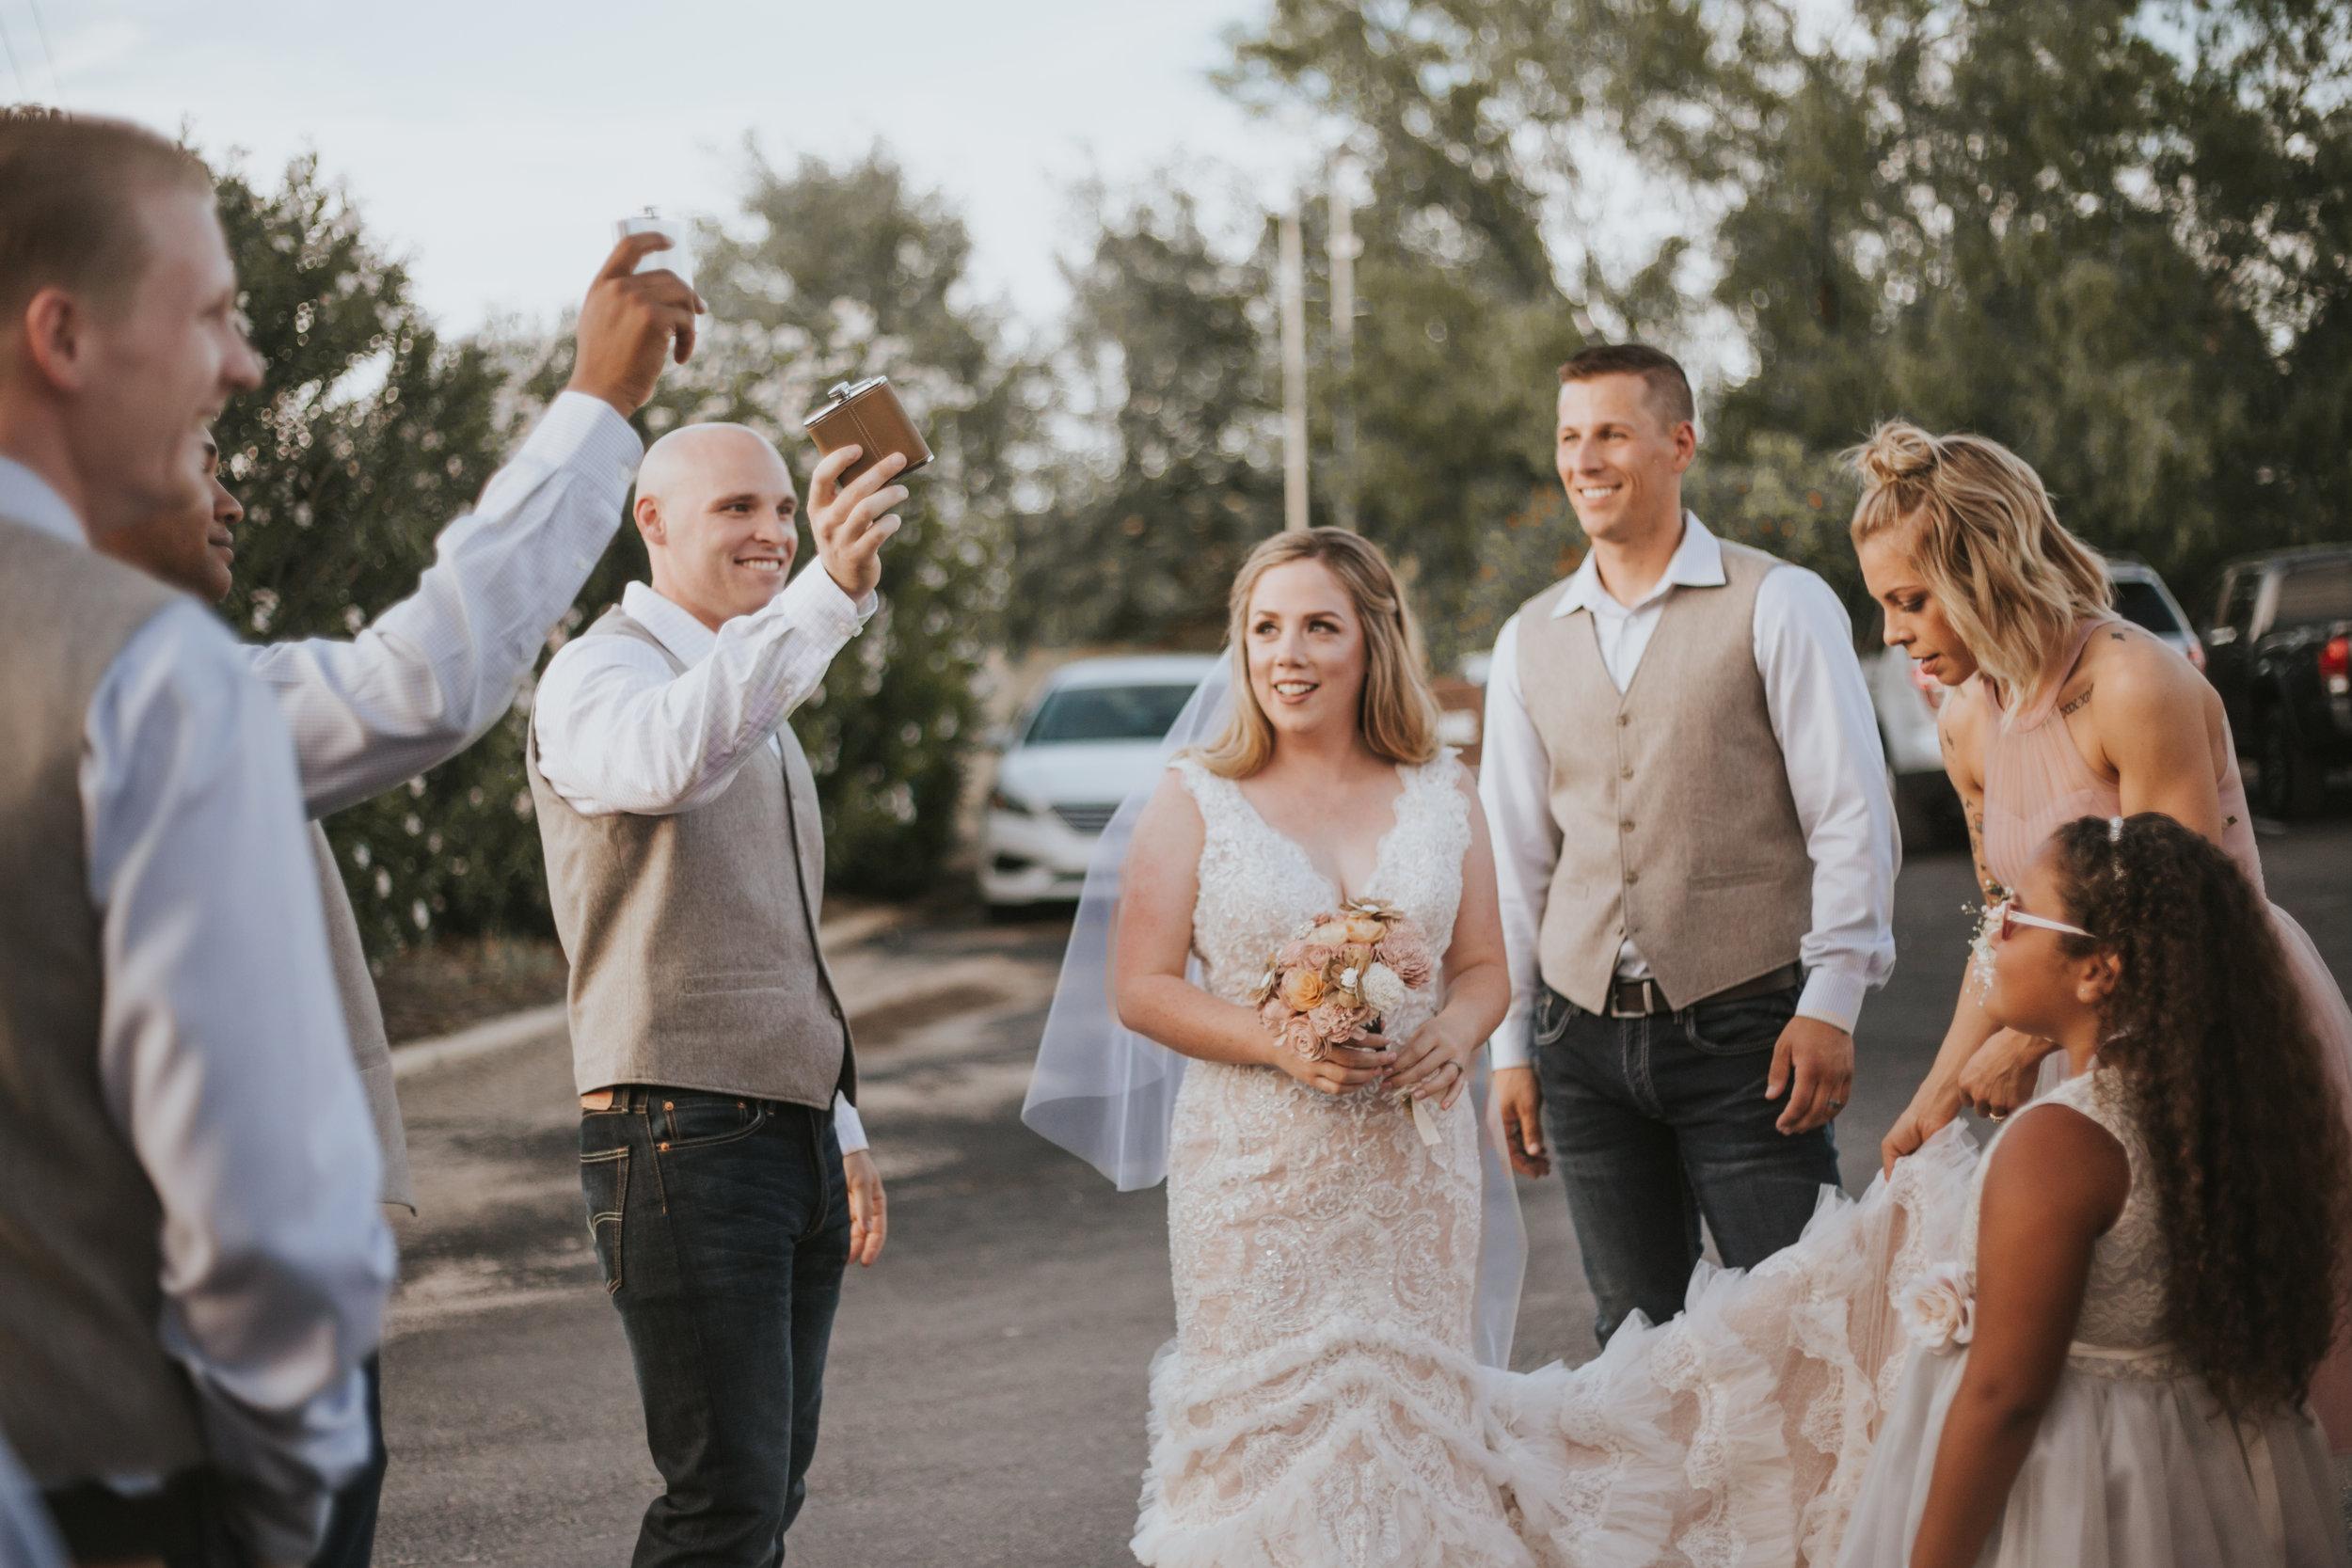 william-taylor-fabens-texas-wedding-38